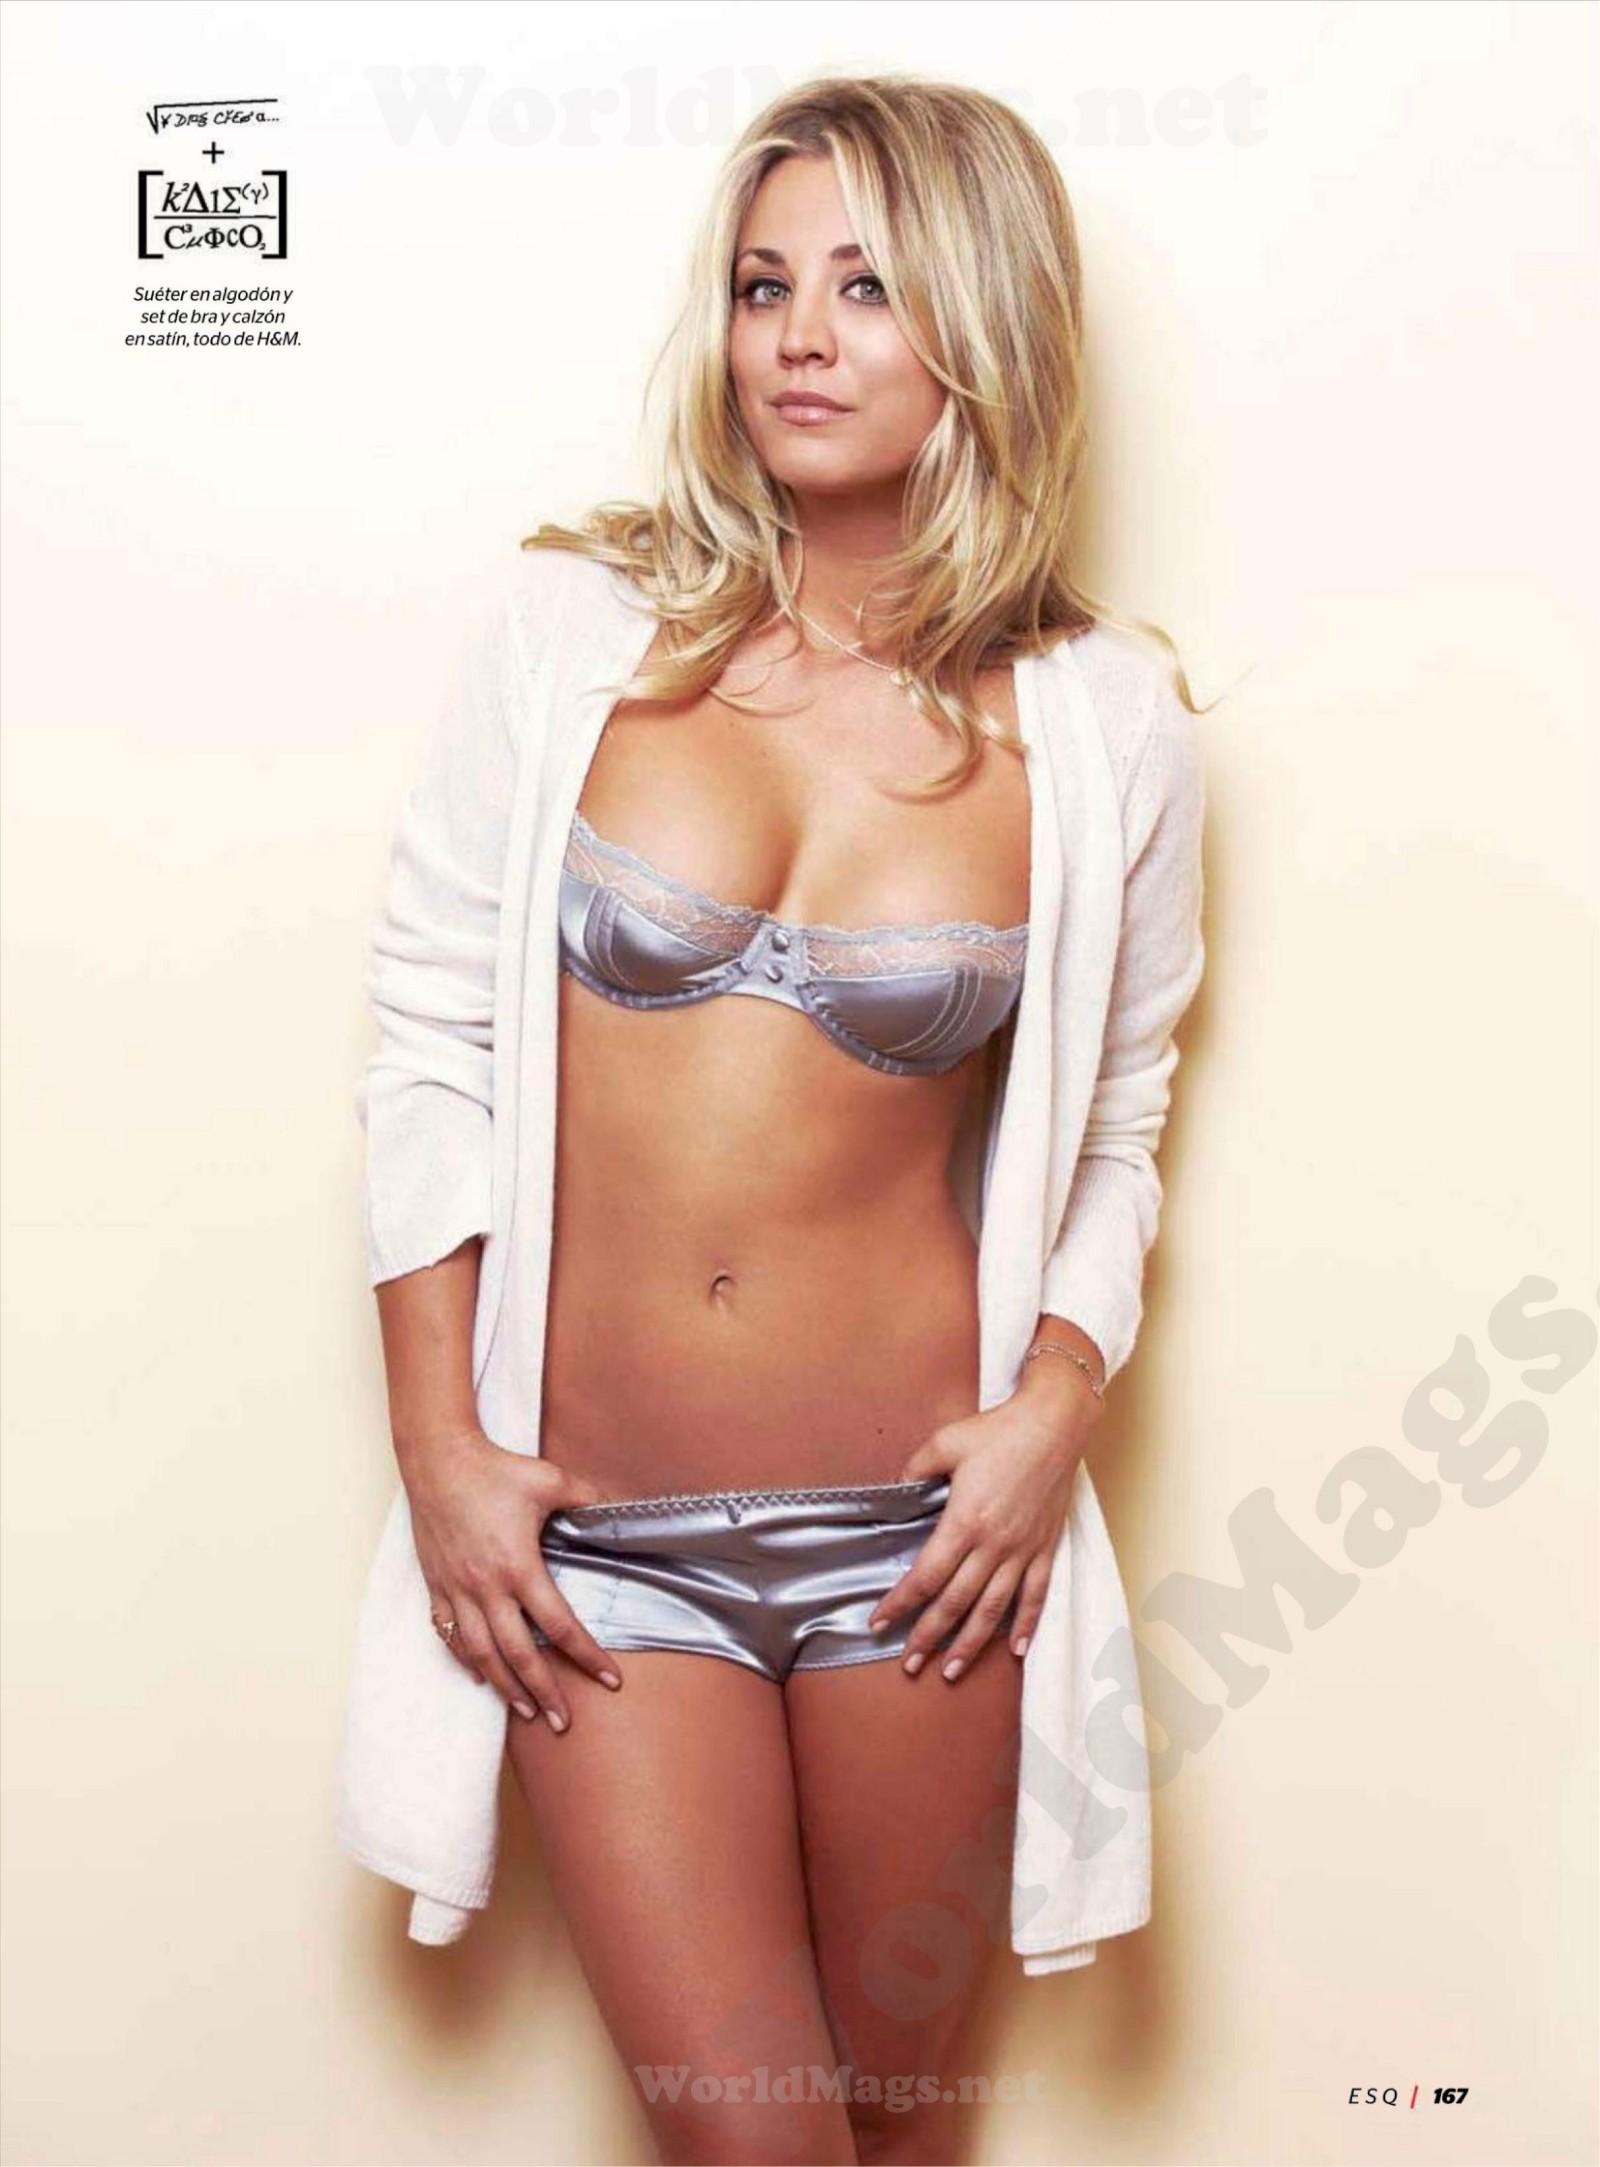 Lindsay lohan new york mag photos Top TV Shows, Recaps, New Movies. - Us Weekly